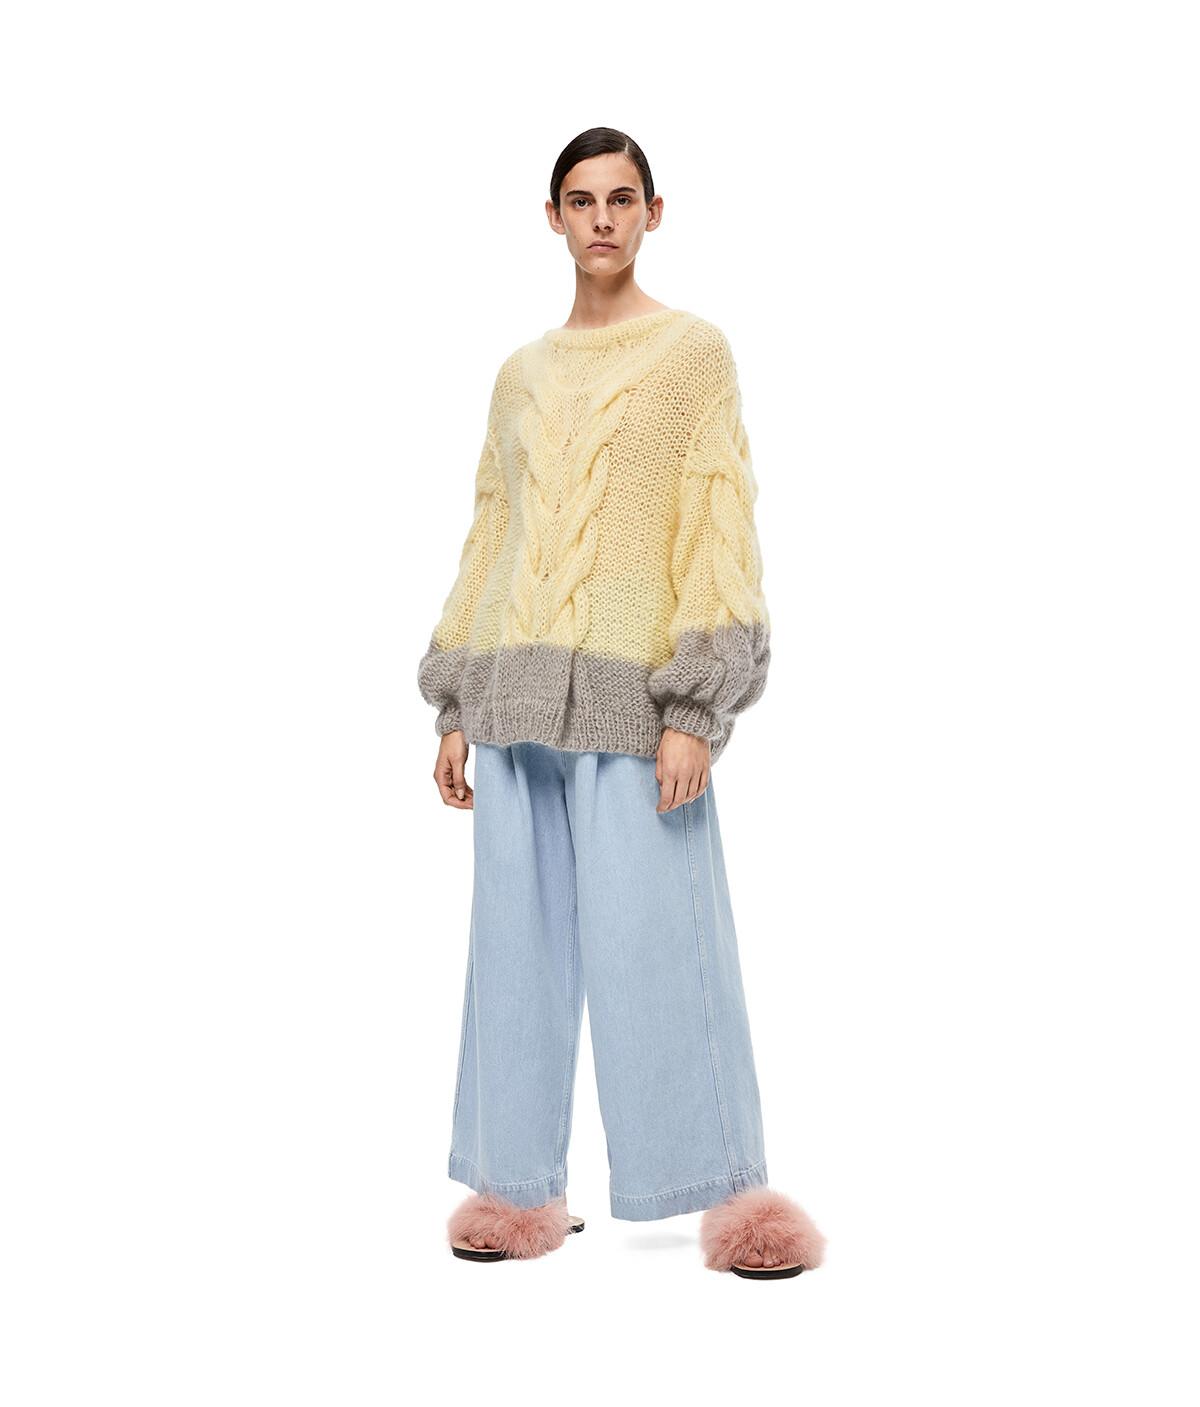 LOEWE Oversize Sweater Amarillo/Gris front